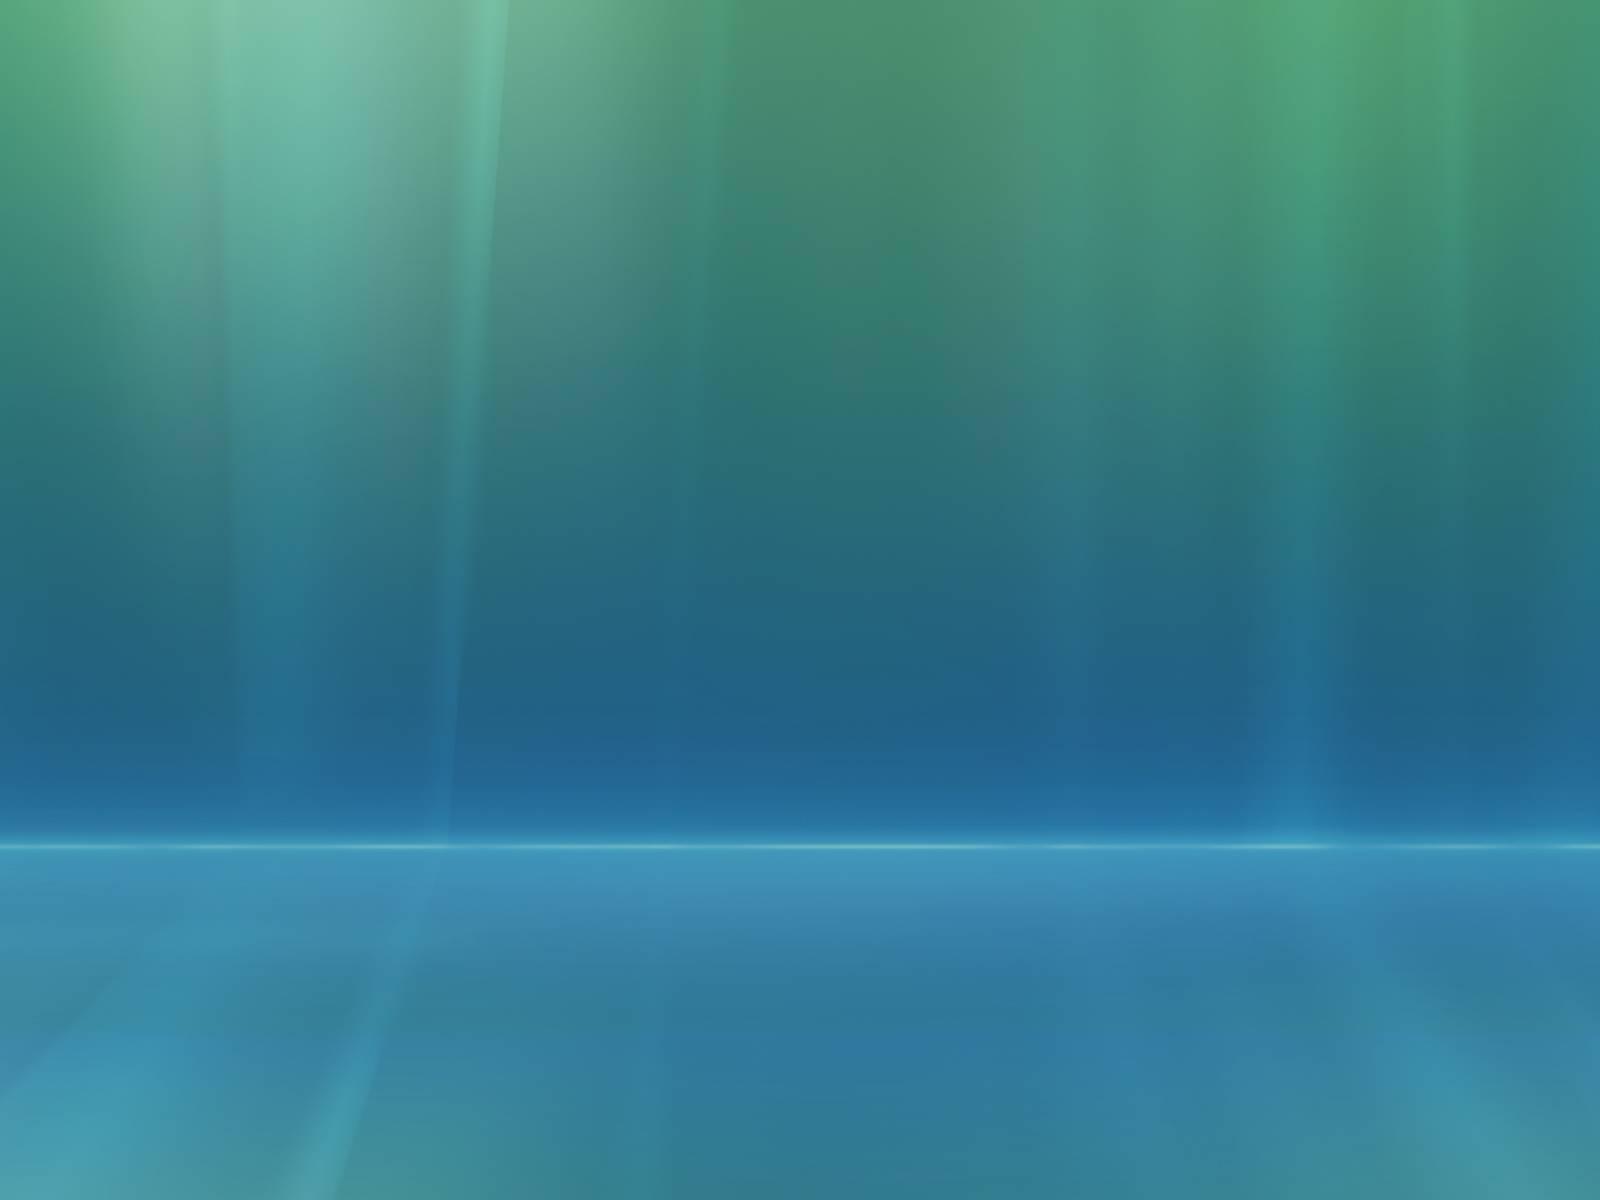 Windows Vista Aurora Wallpaper 894442 Hd Wallpaper Backgrounds Download